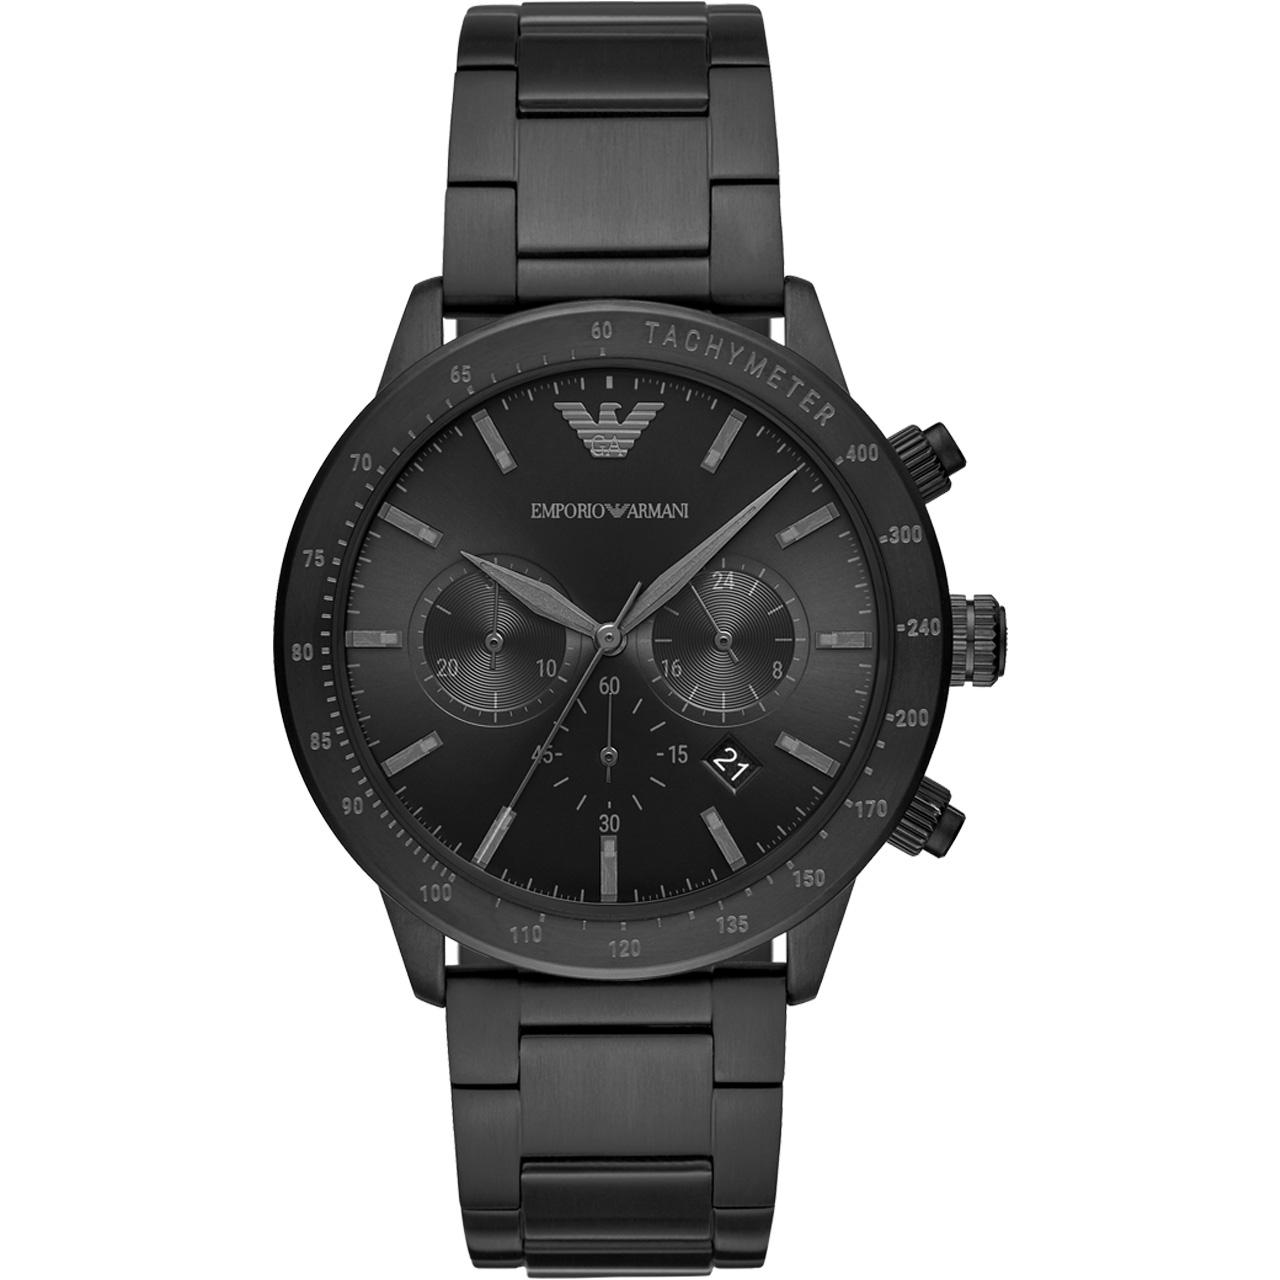 Emporio Armani阿玛尼手表男 时尚运动酷黑钢带石英男表AR11242